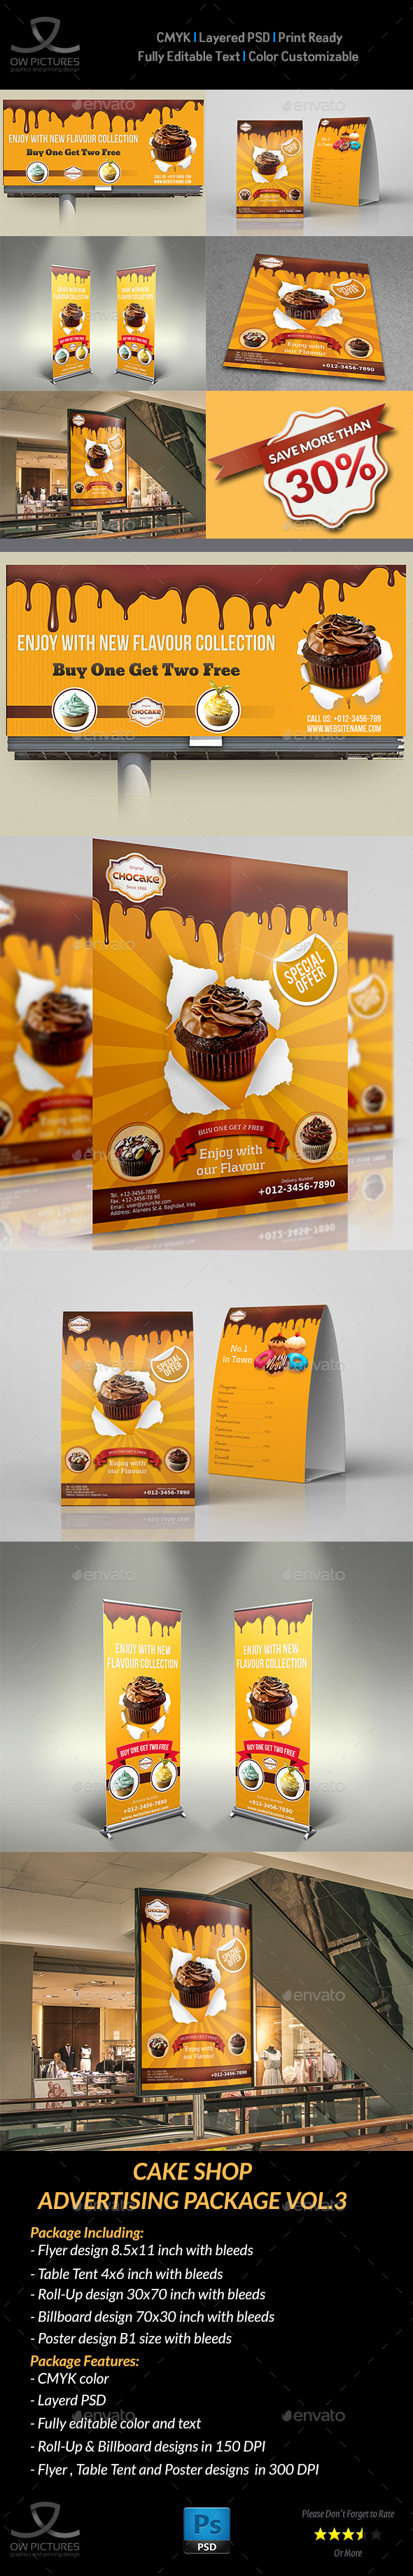 Cake and Cafe Advertising Bundle Vol3 - Signage Print Templates